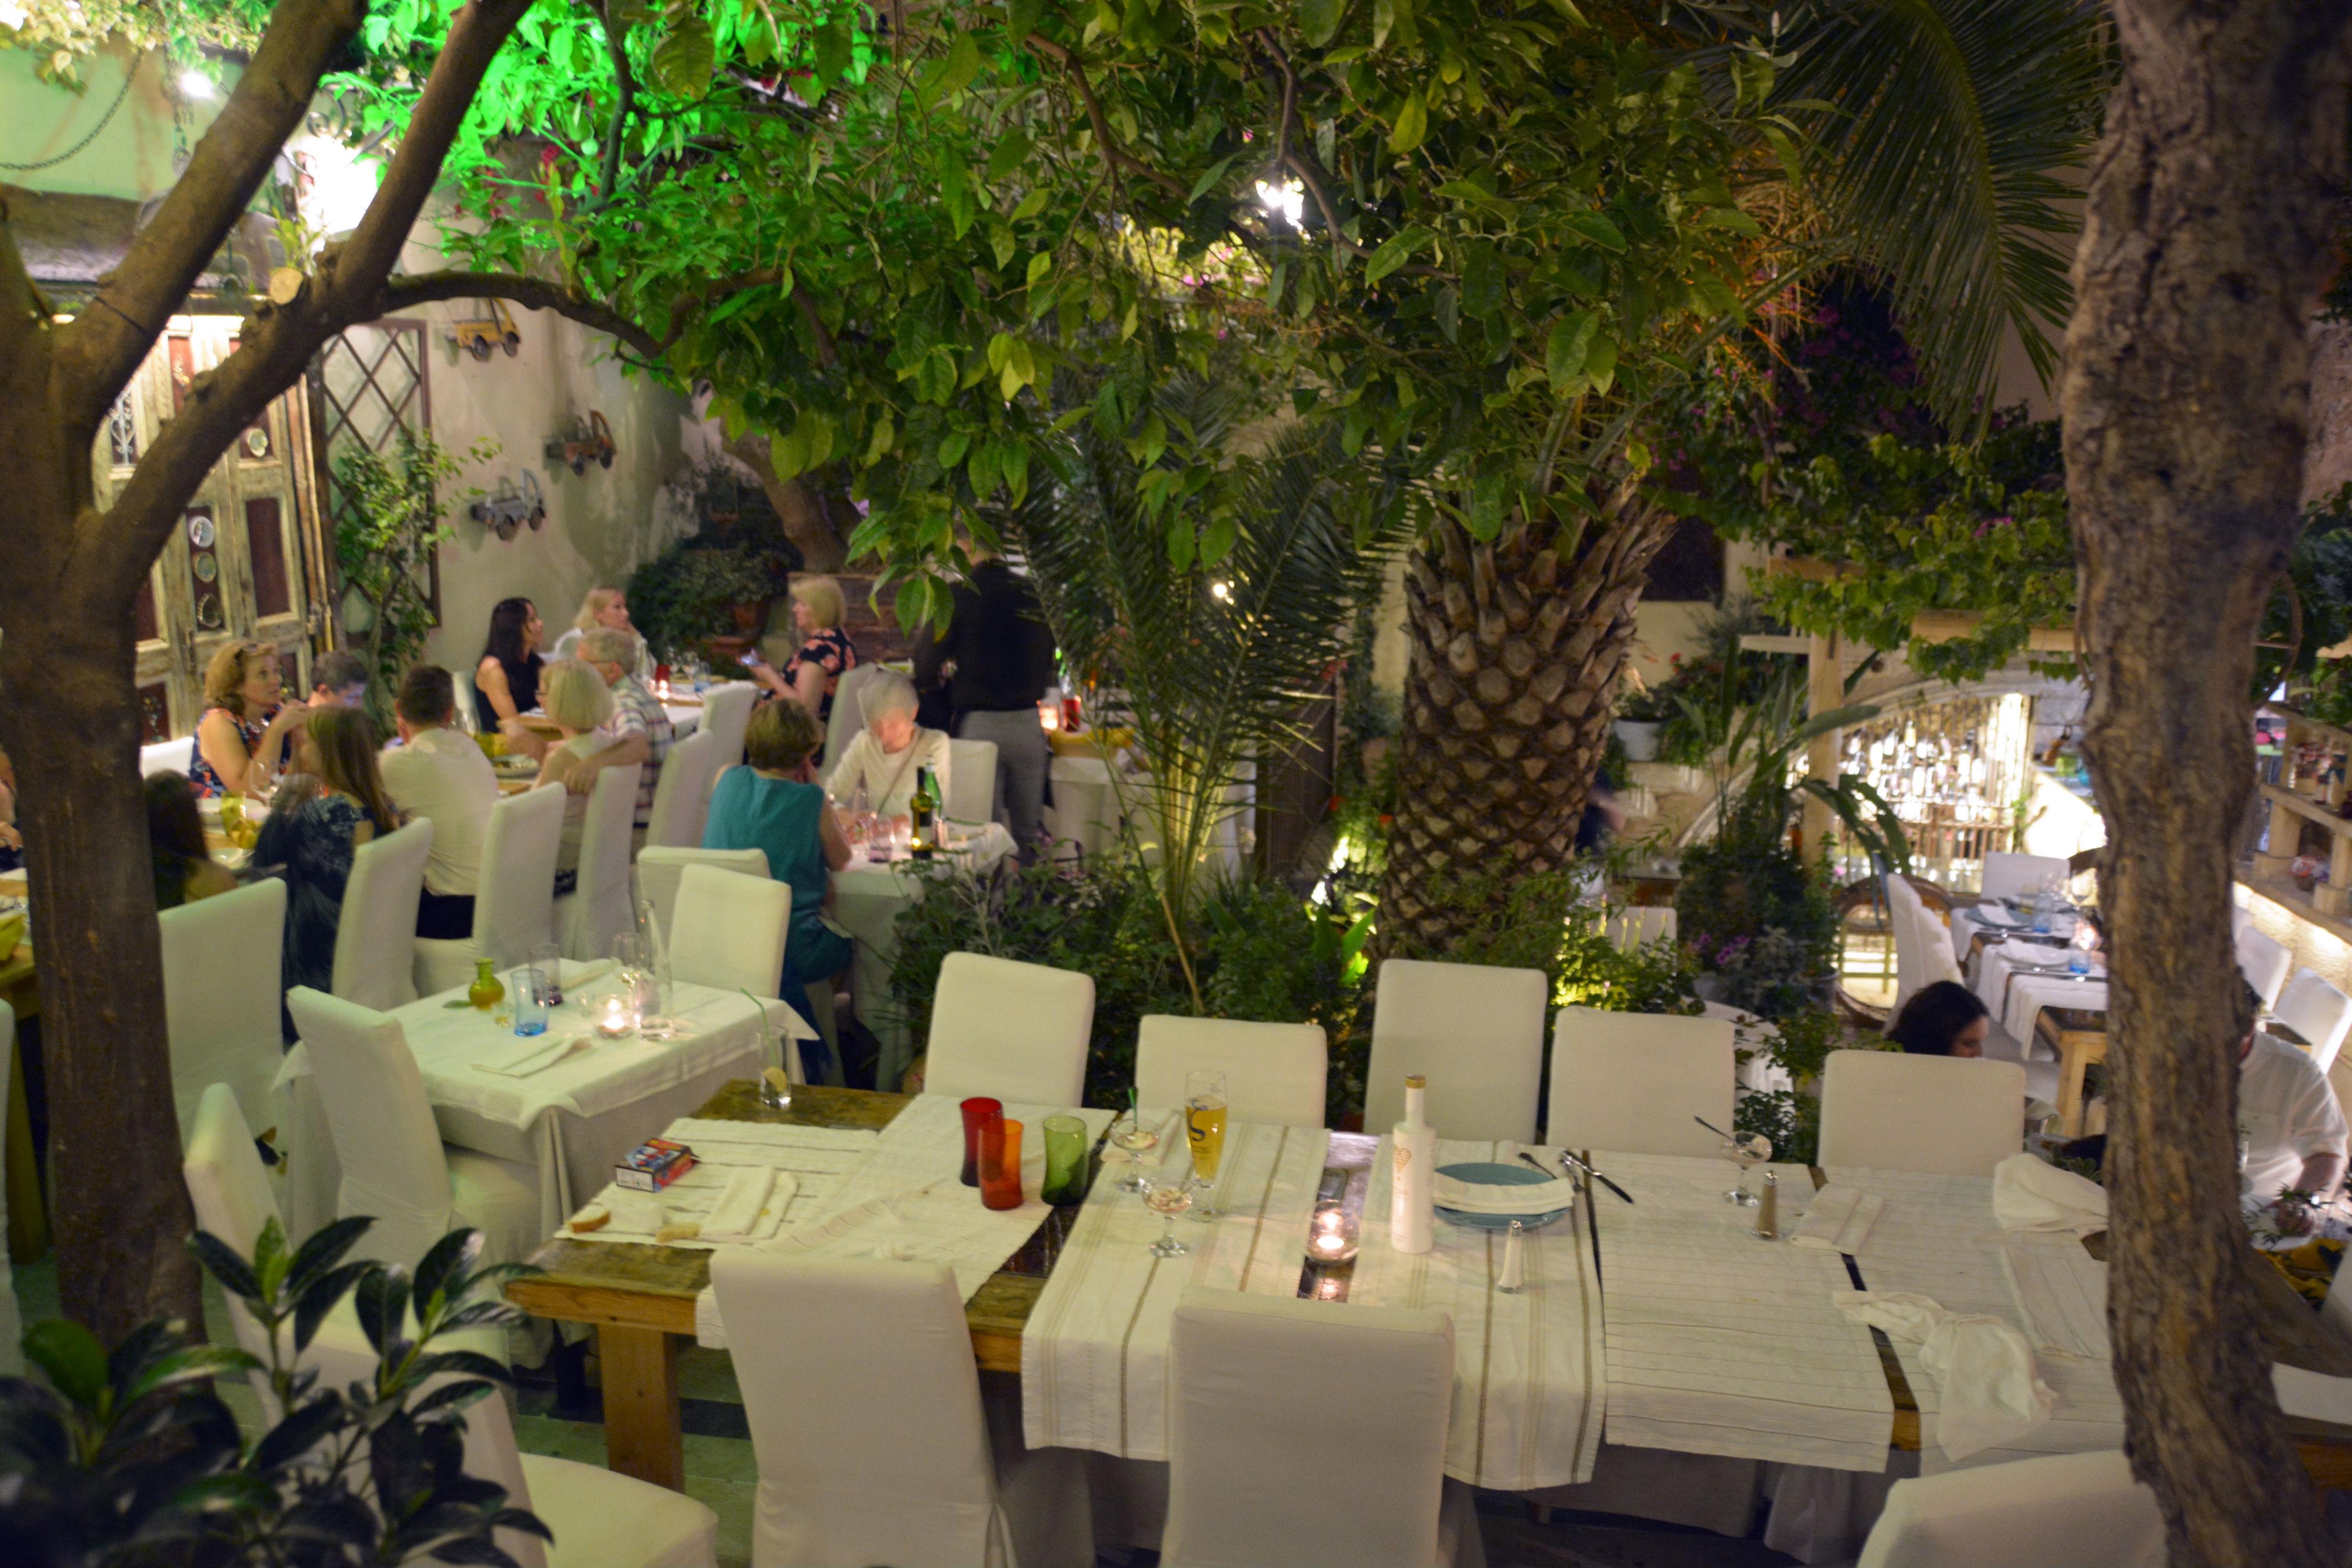 Large Dining Room Set Avli In Rethymnon Cretan Dining Defined Travel Greece